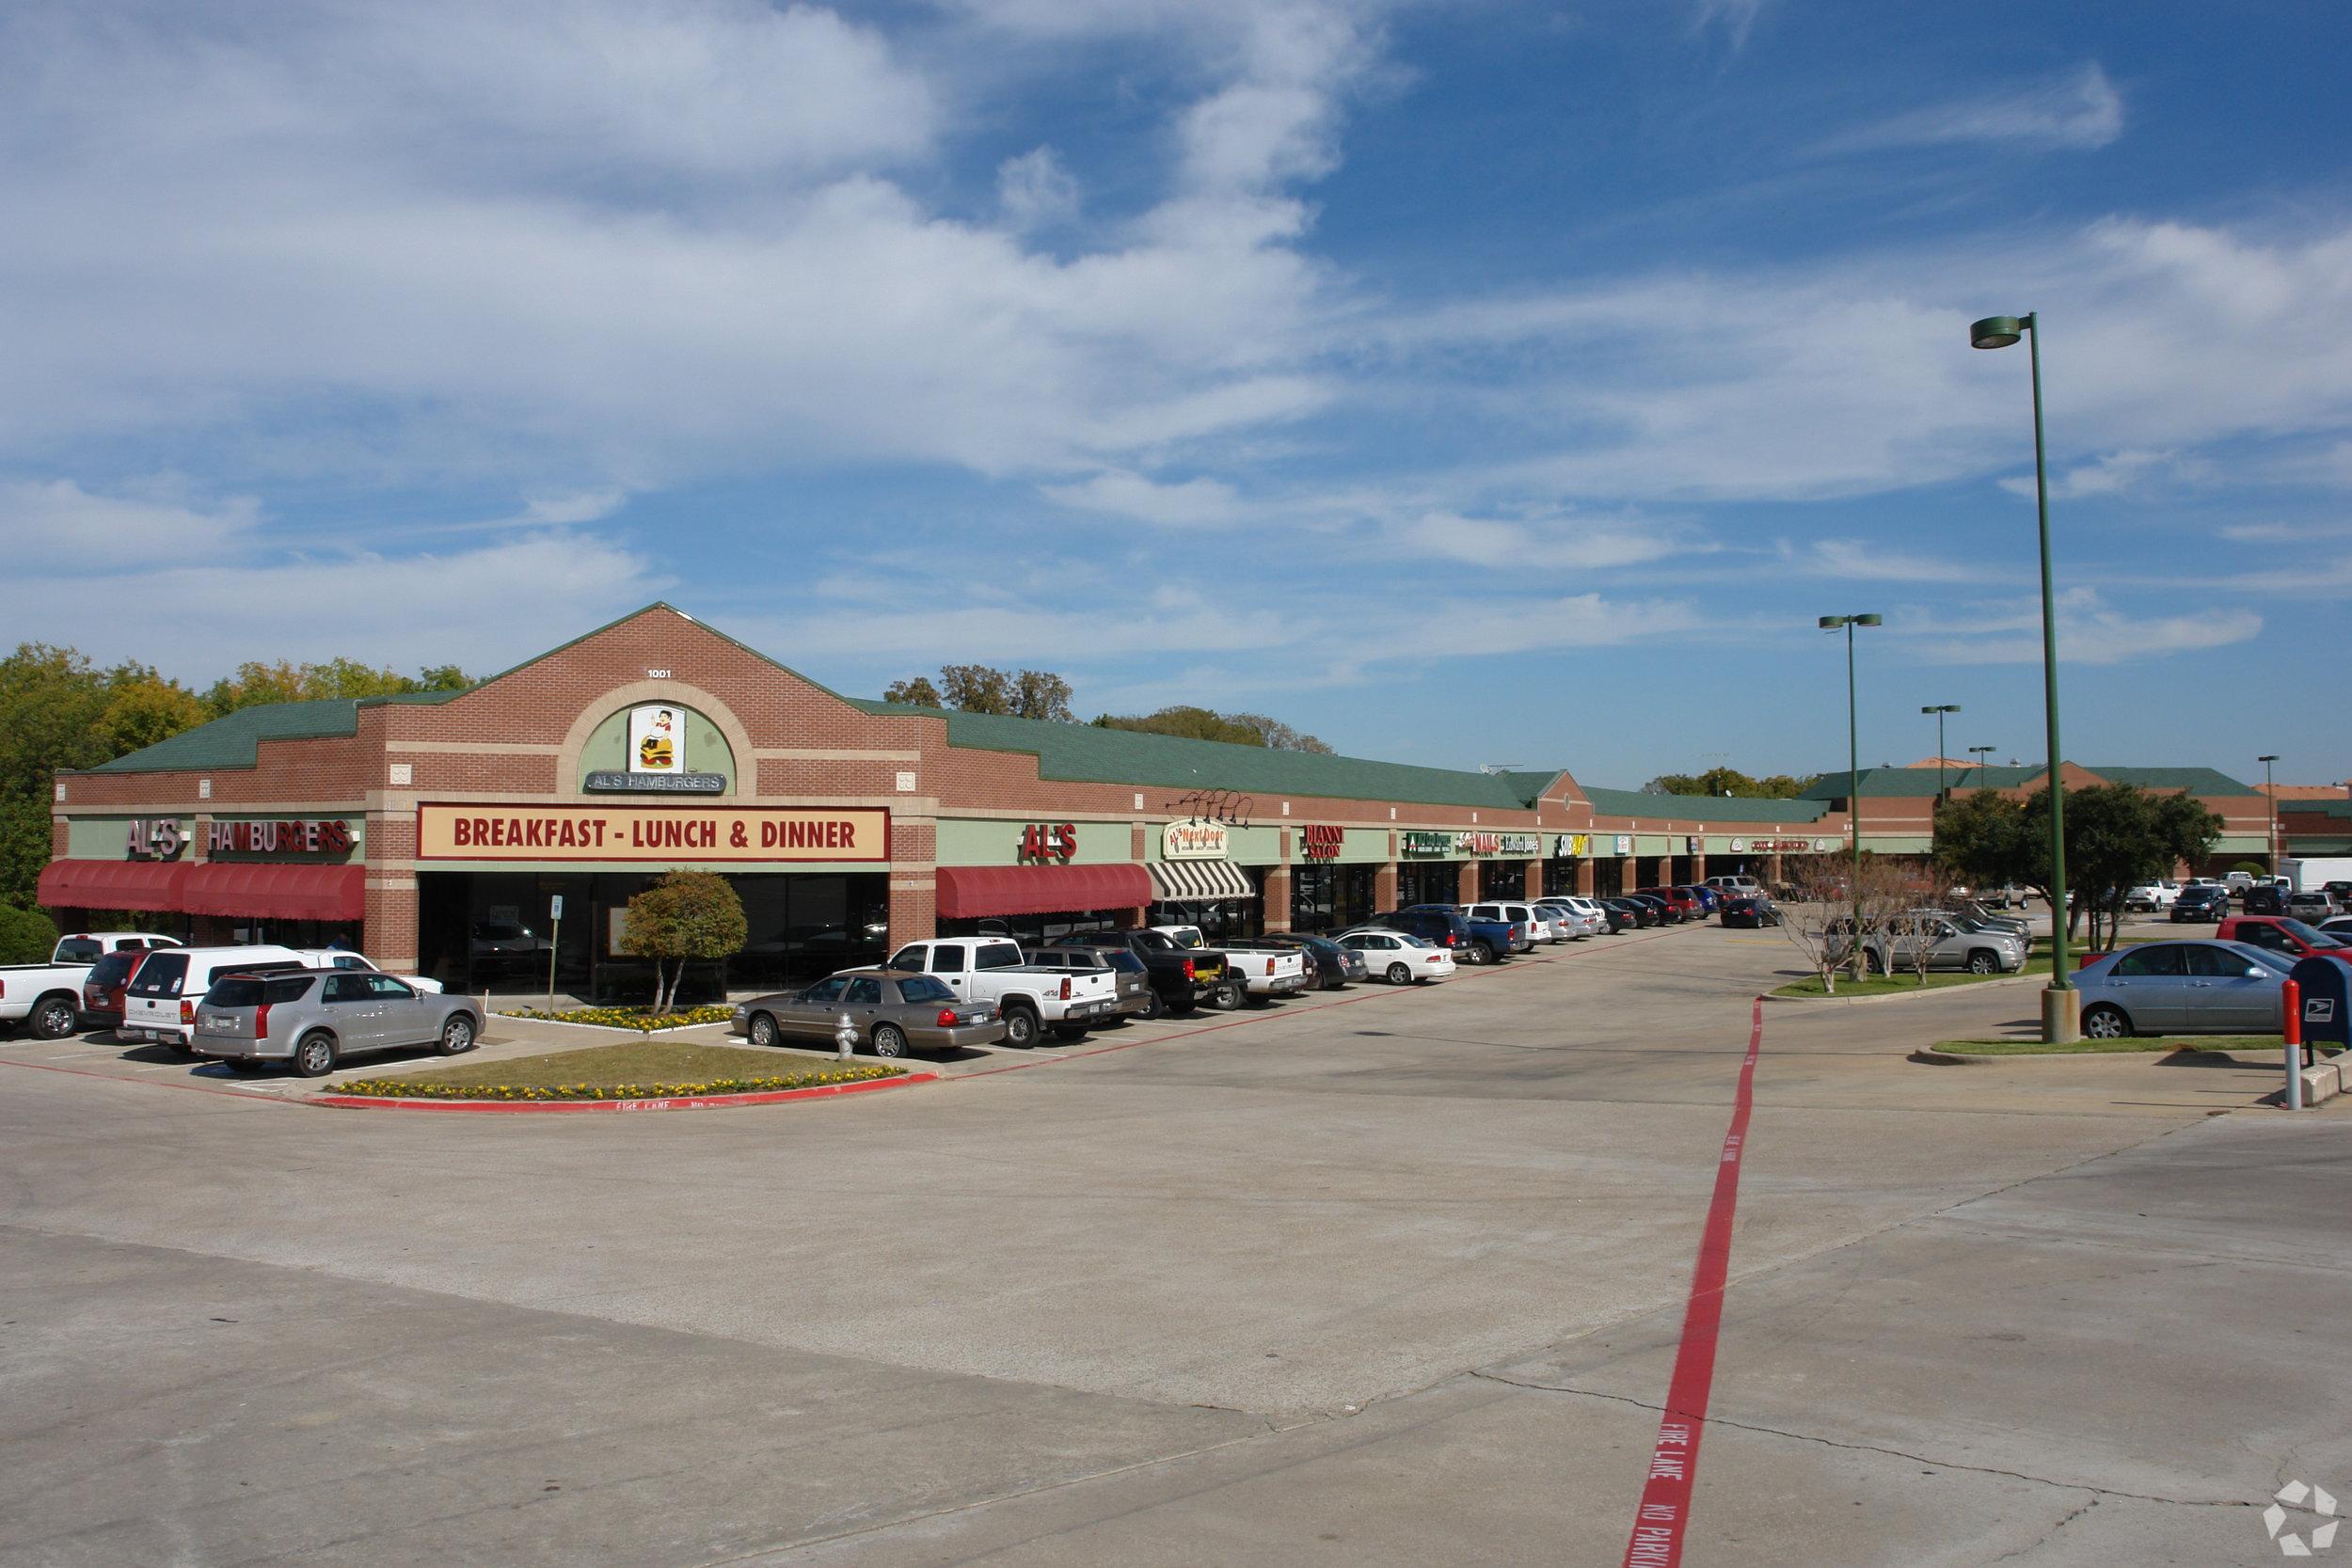 St. Michael's of Arlington   1001 NE Green Oaks Blvd, Arlington, TX 76006